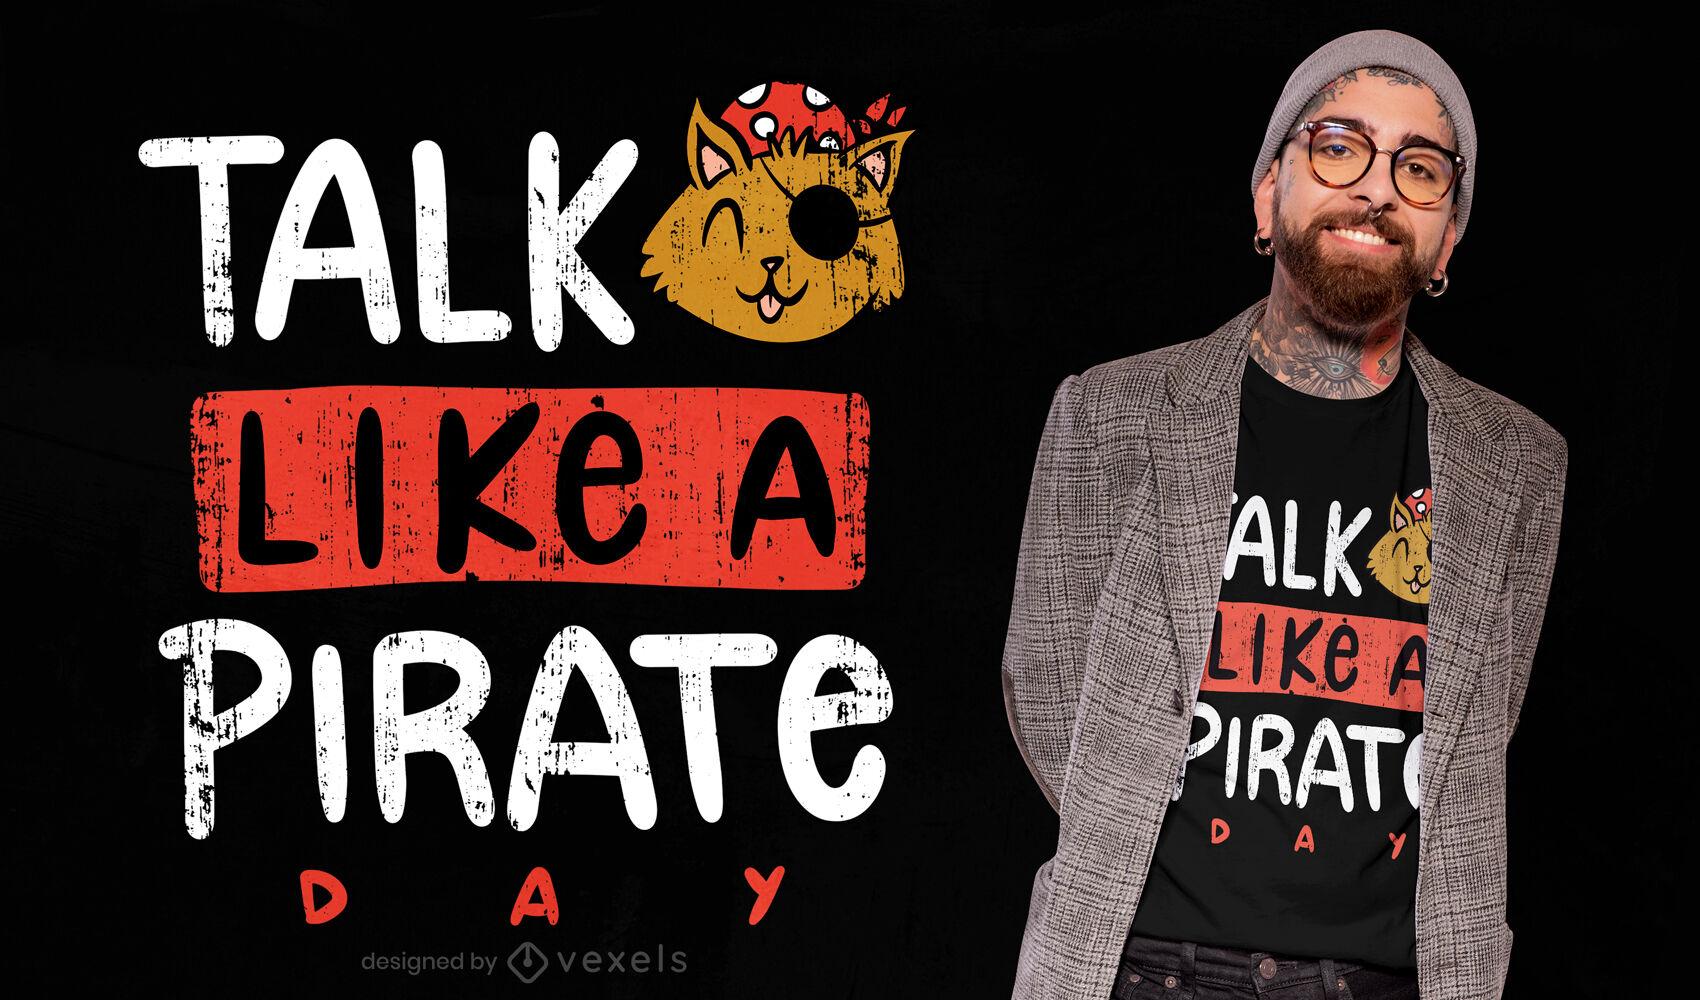 Talk like pirate day t-shirt design